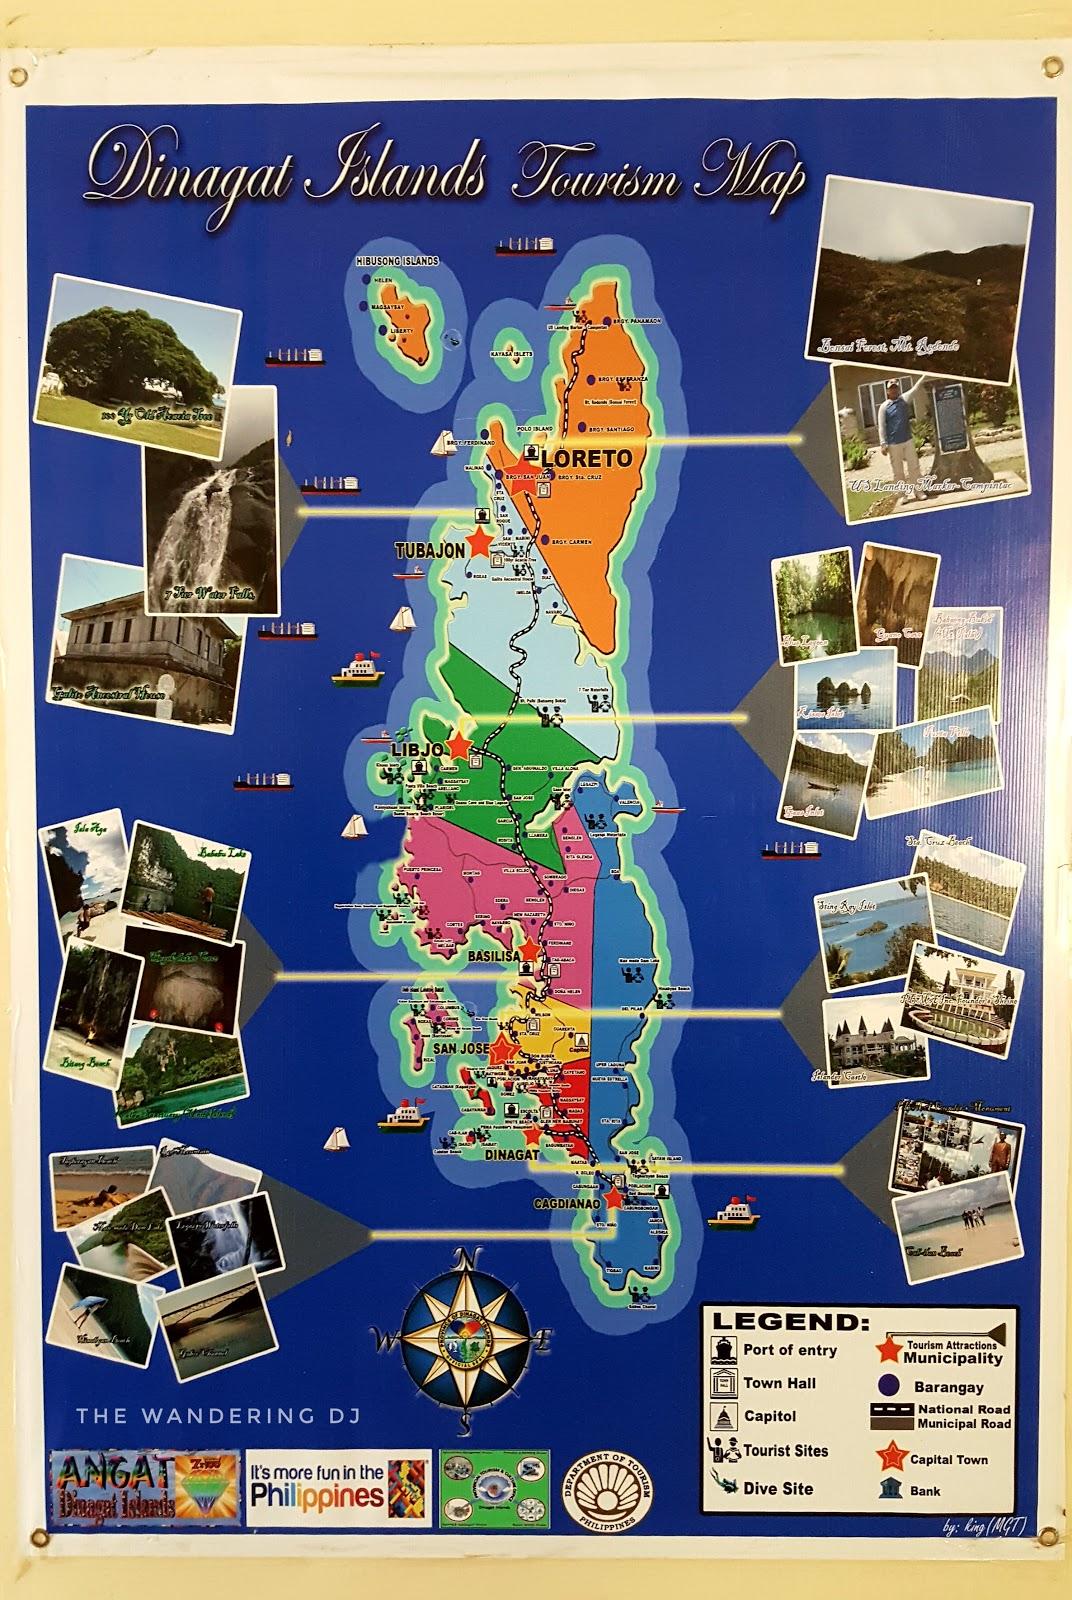 Angat Dinagat Islands! A Very Promising Tourist Destination in